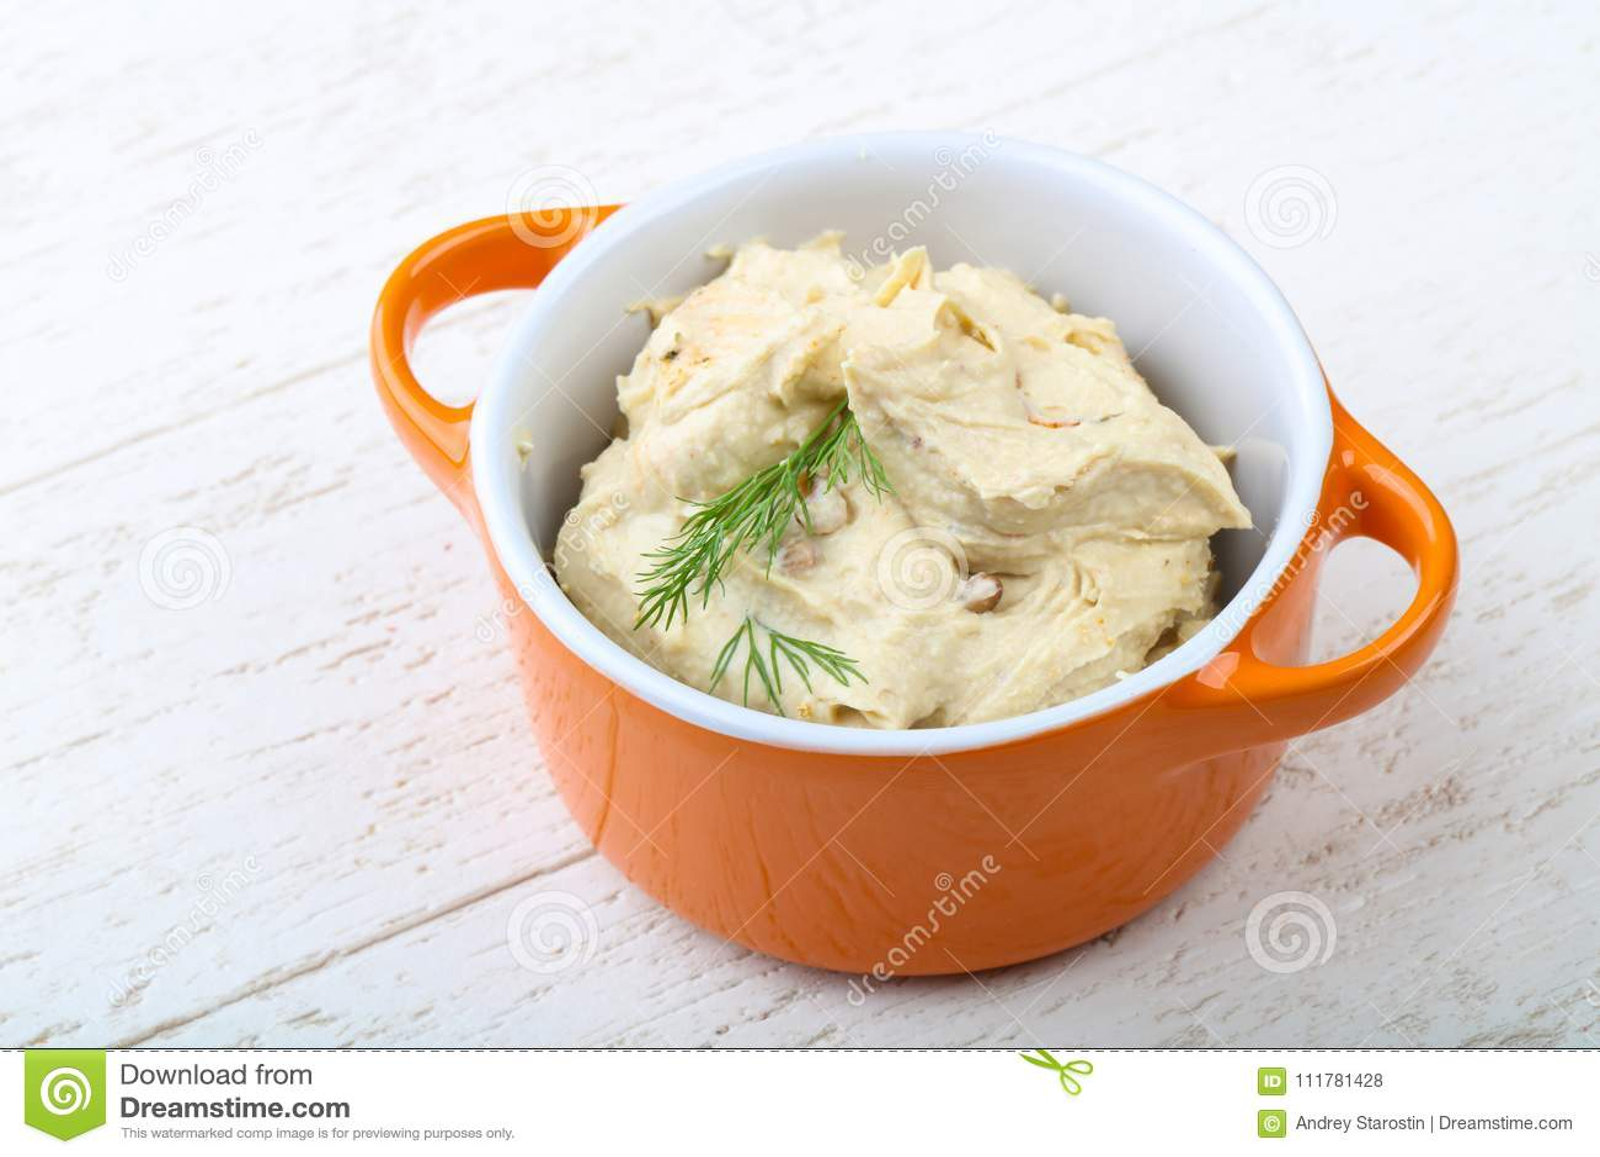 Arabic traditional cuisine - hummus